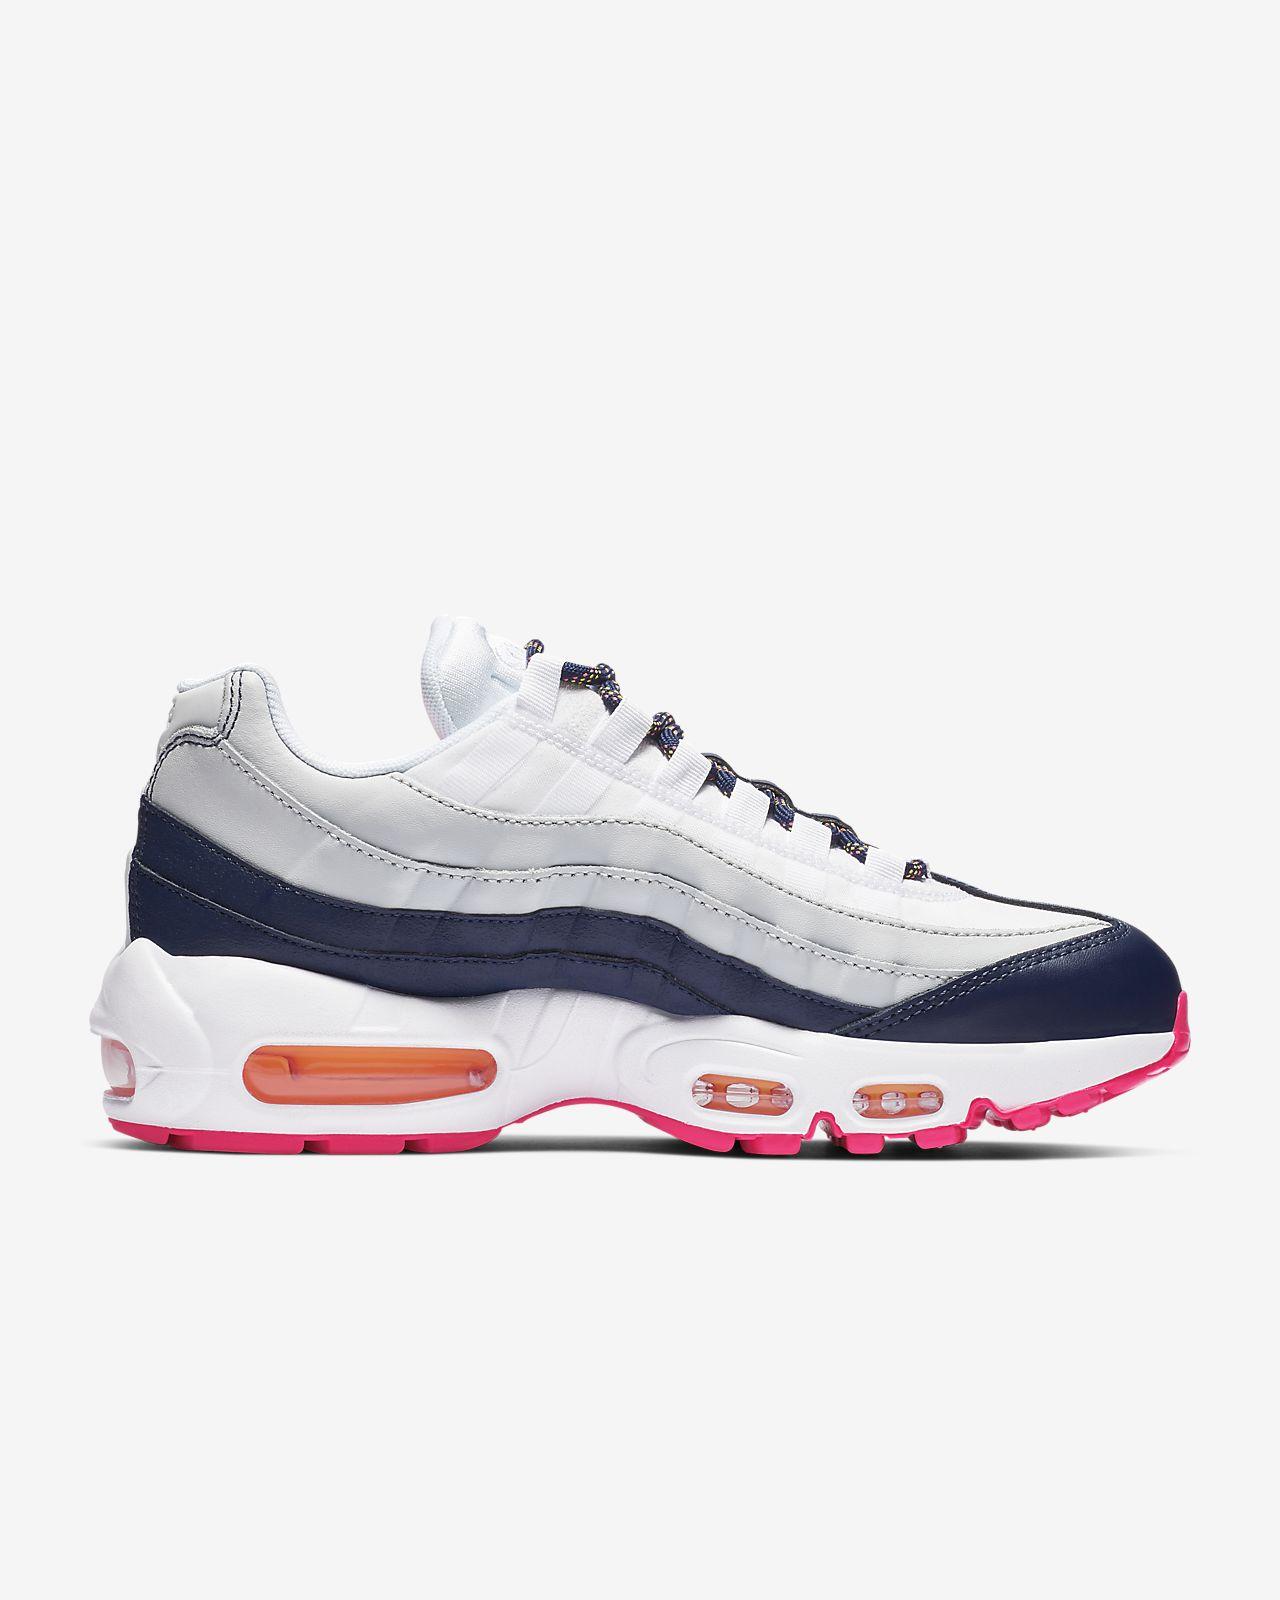 online store eefa0 f898d ... Nike Air Max 95 Premium Womens Shoe